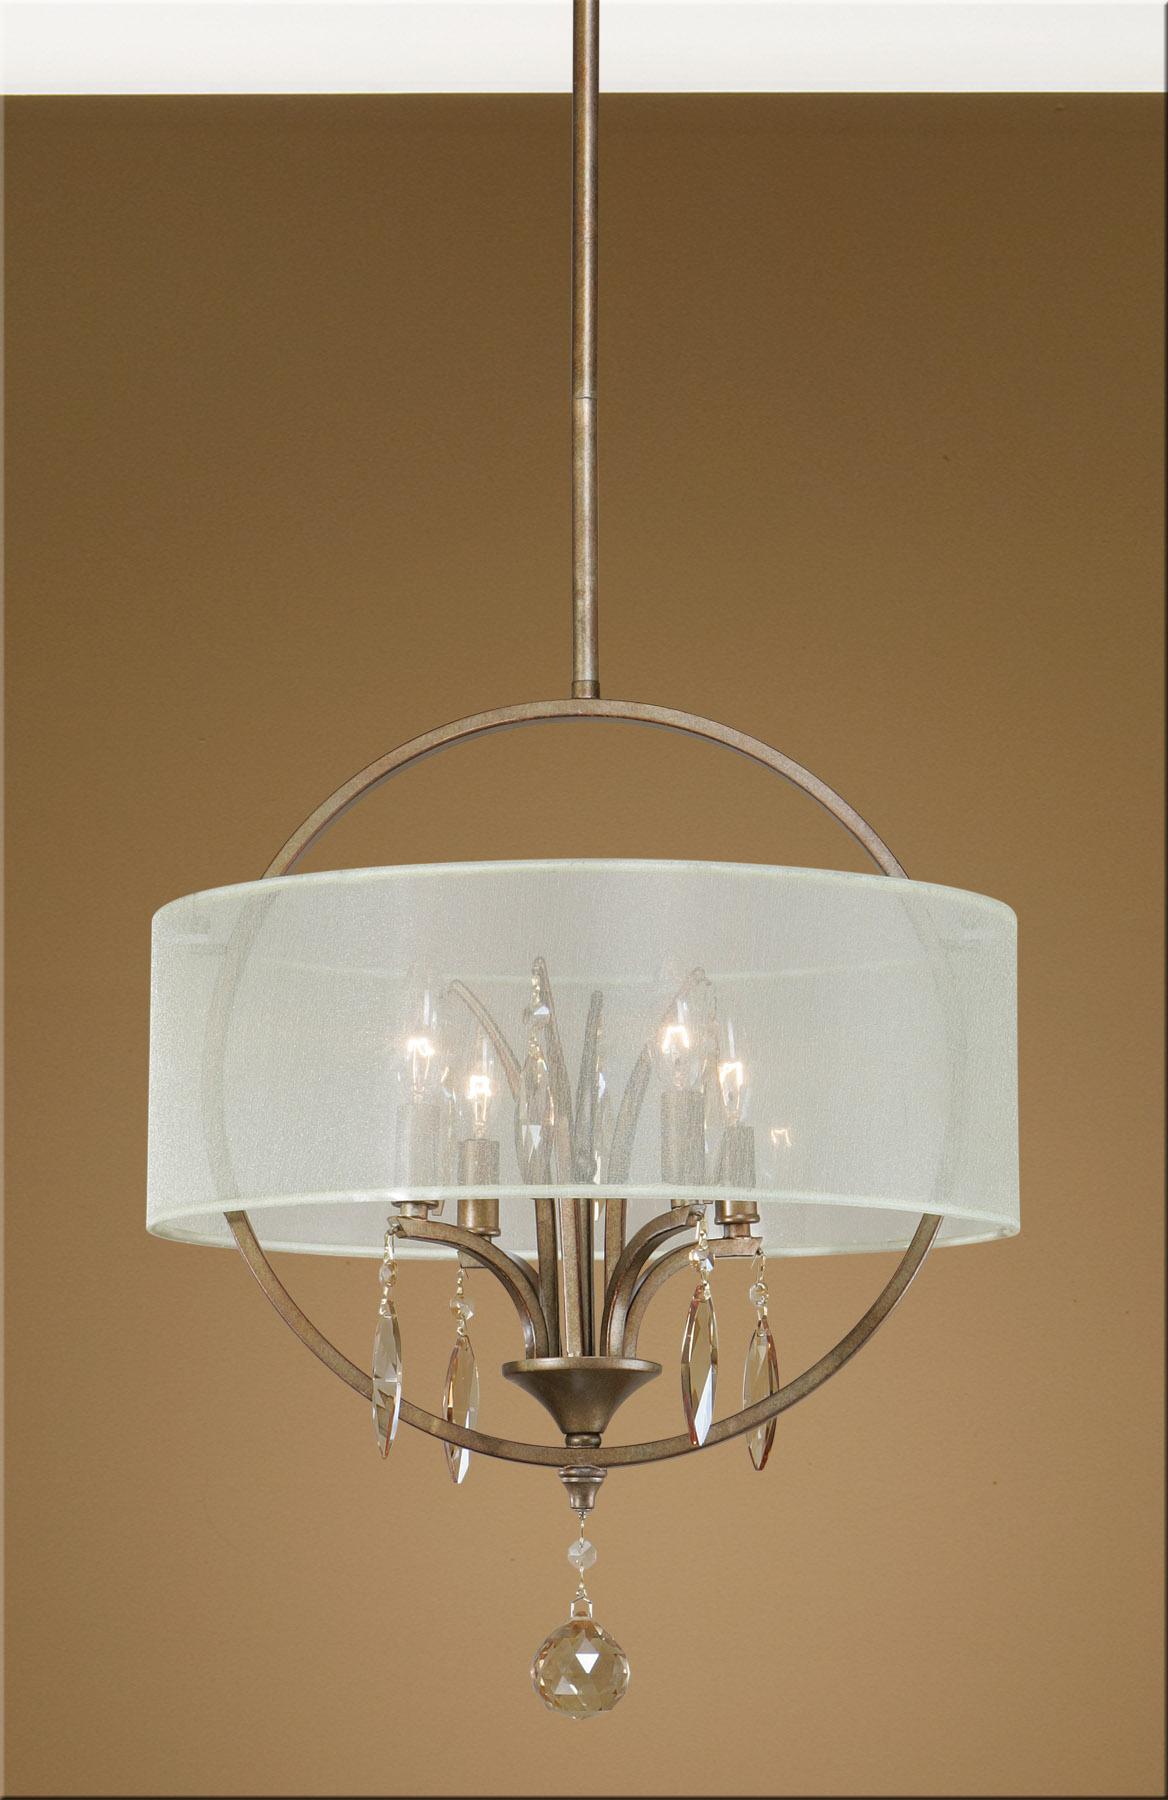 Uttermost Lighting Fixtures Alenya 4 Light Pendant - Item Number: 21962